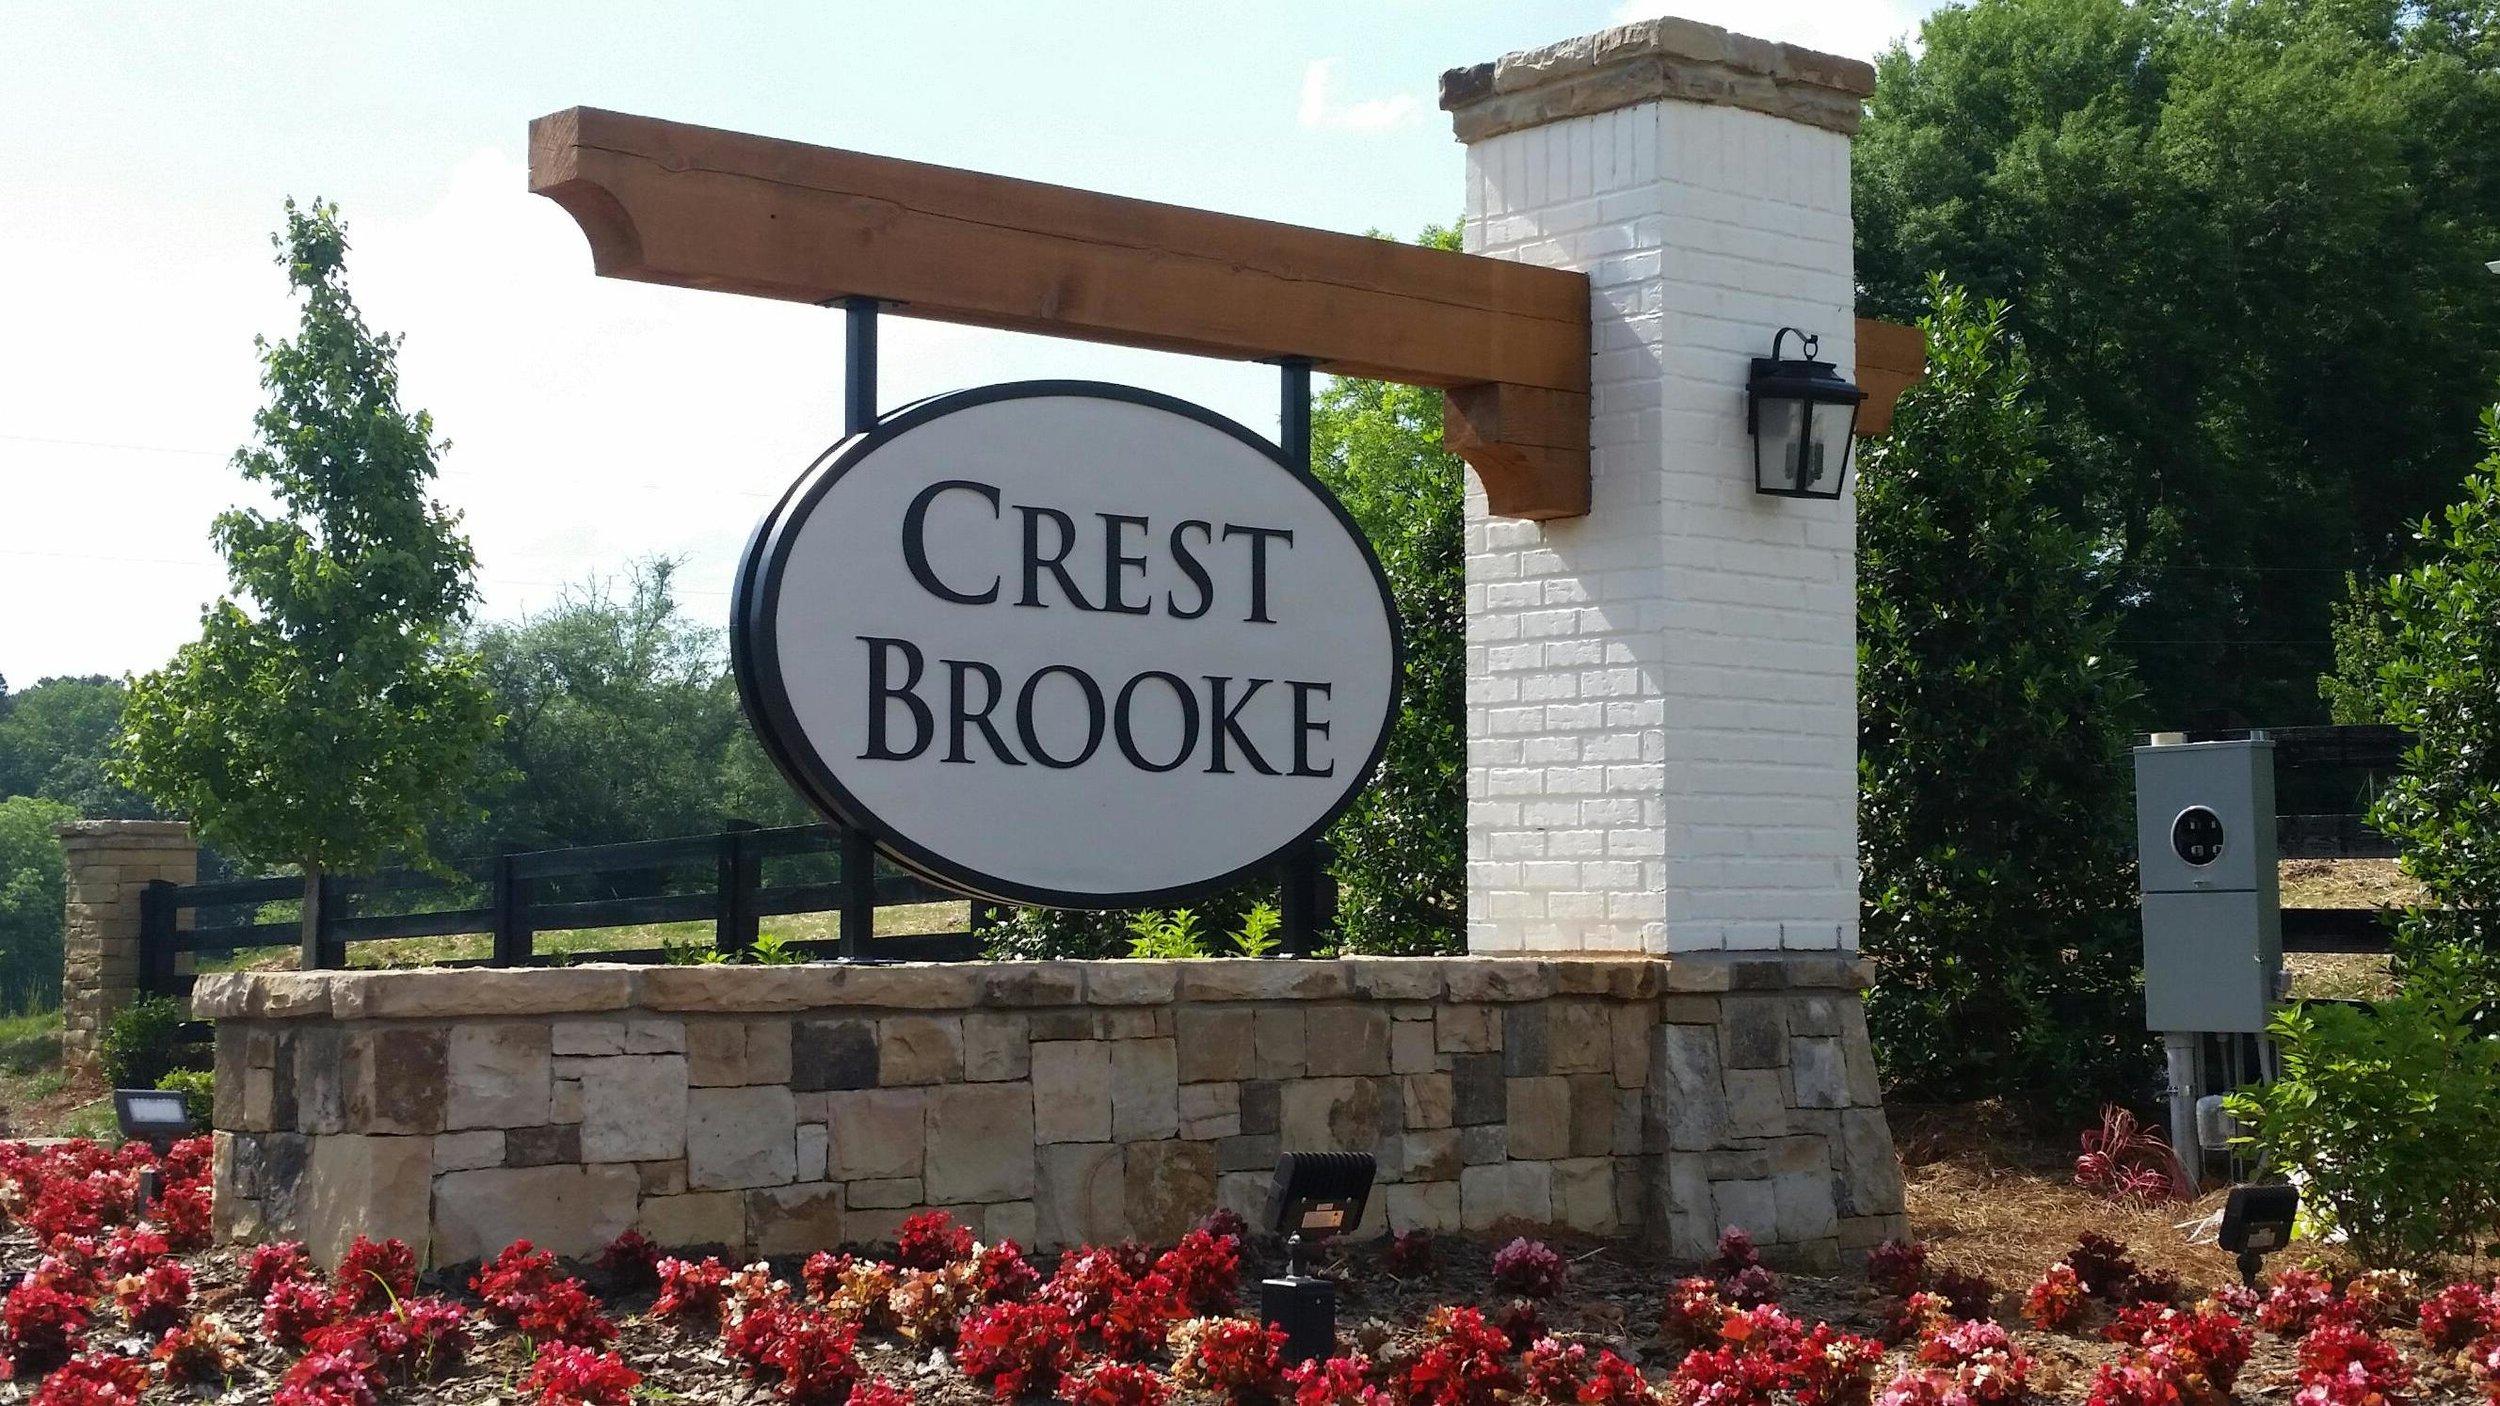 Crest Brooke.jpg